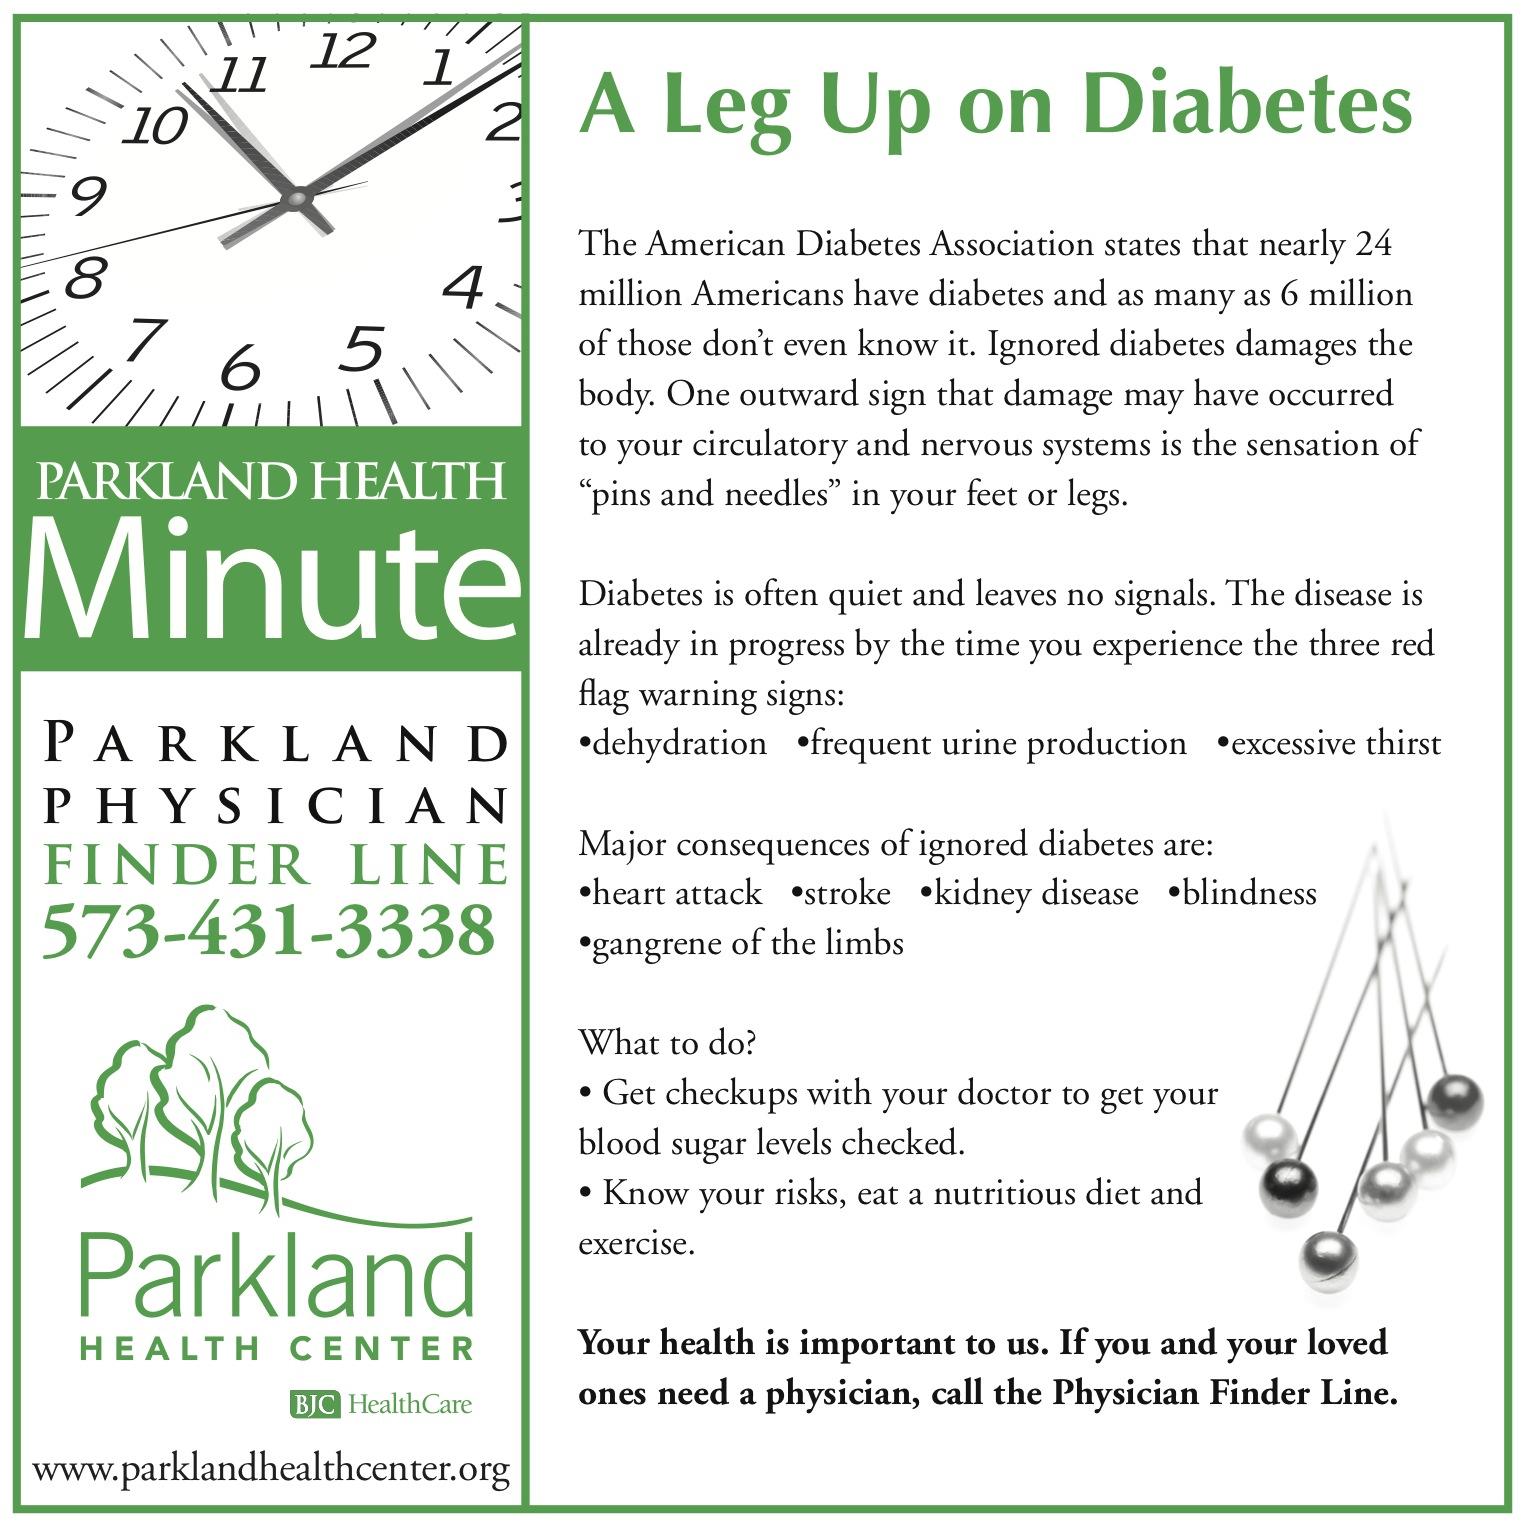 Health minute ad describing diabetes prevention techniques.